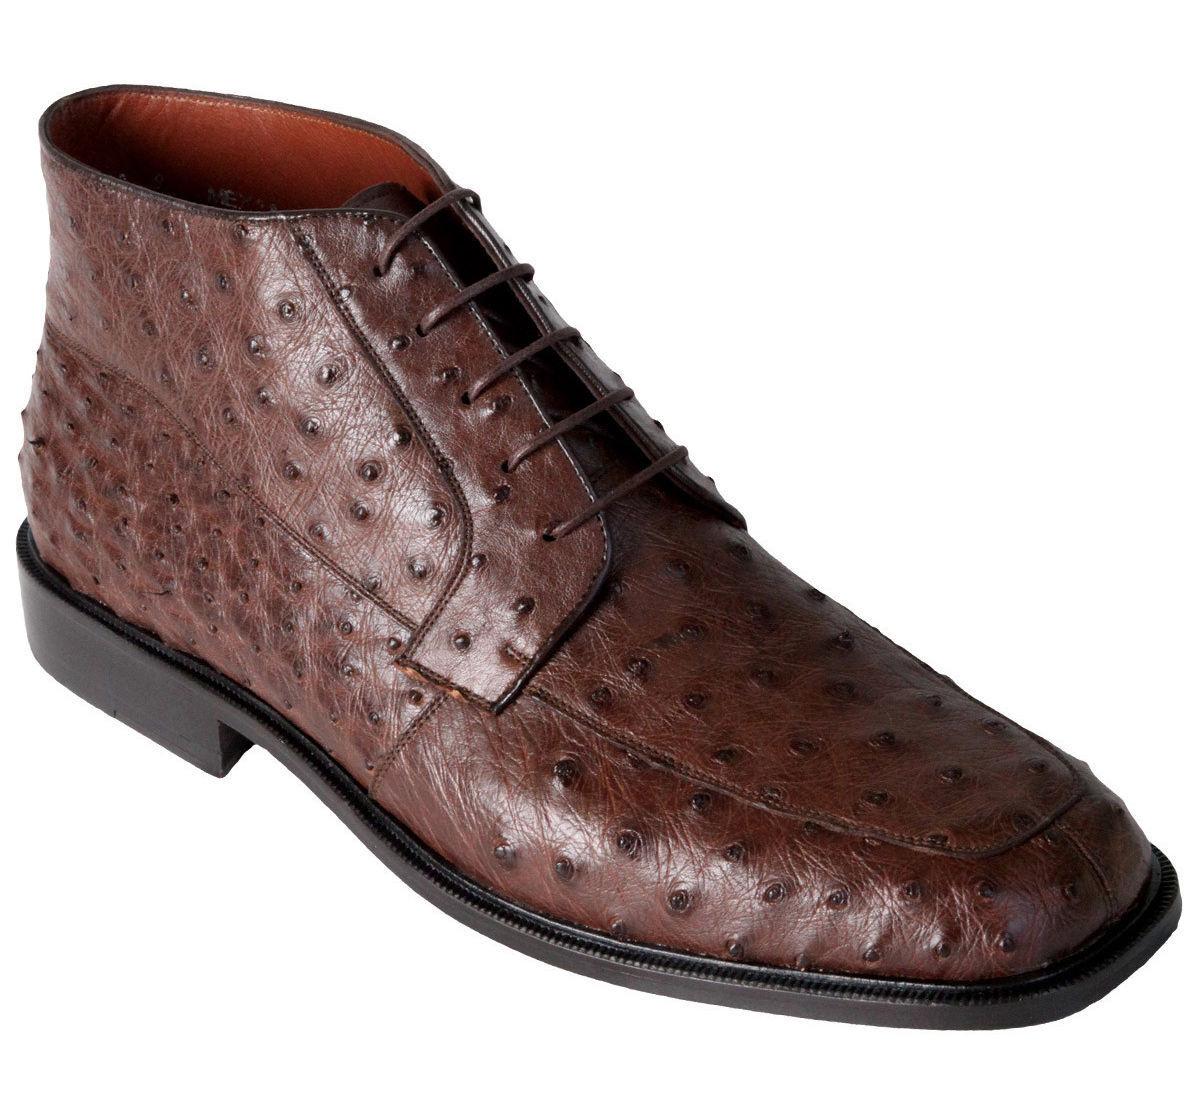 Los Altos Genuine marrón Ostrich Dress Ankle botas Leather Outsole High Top EE+